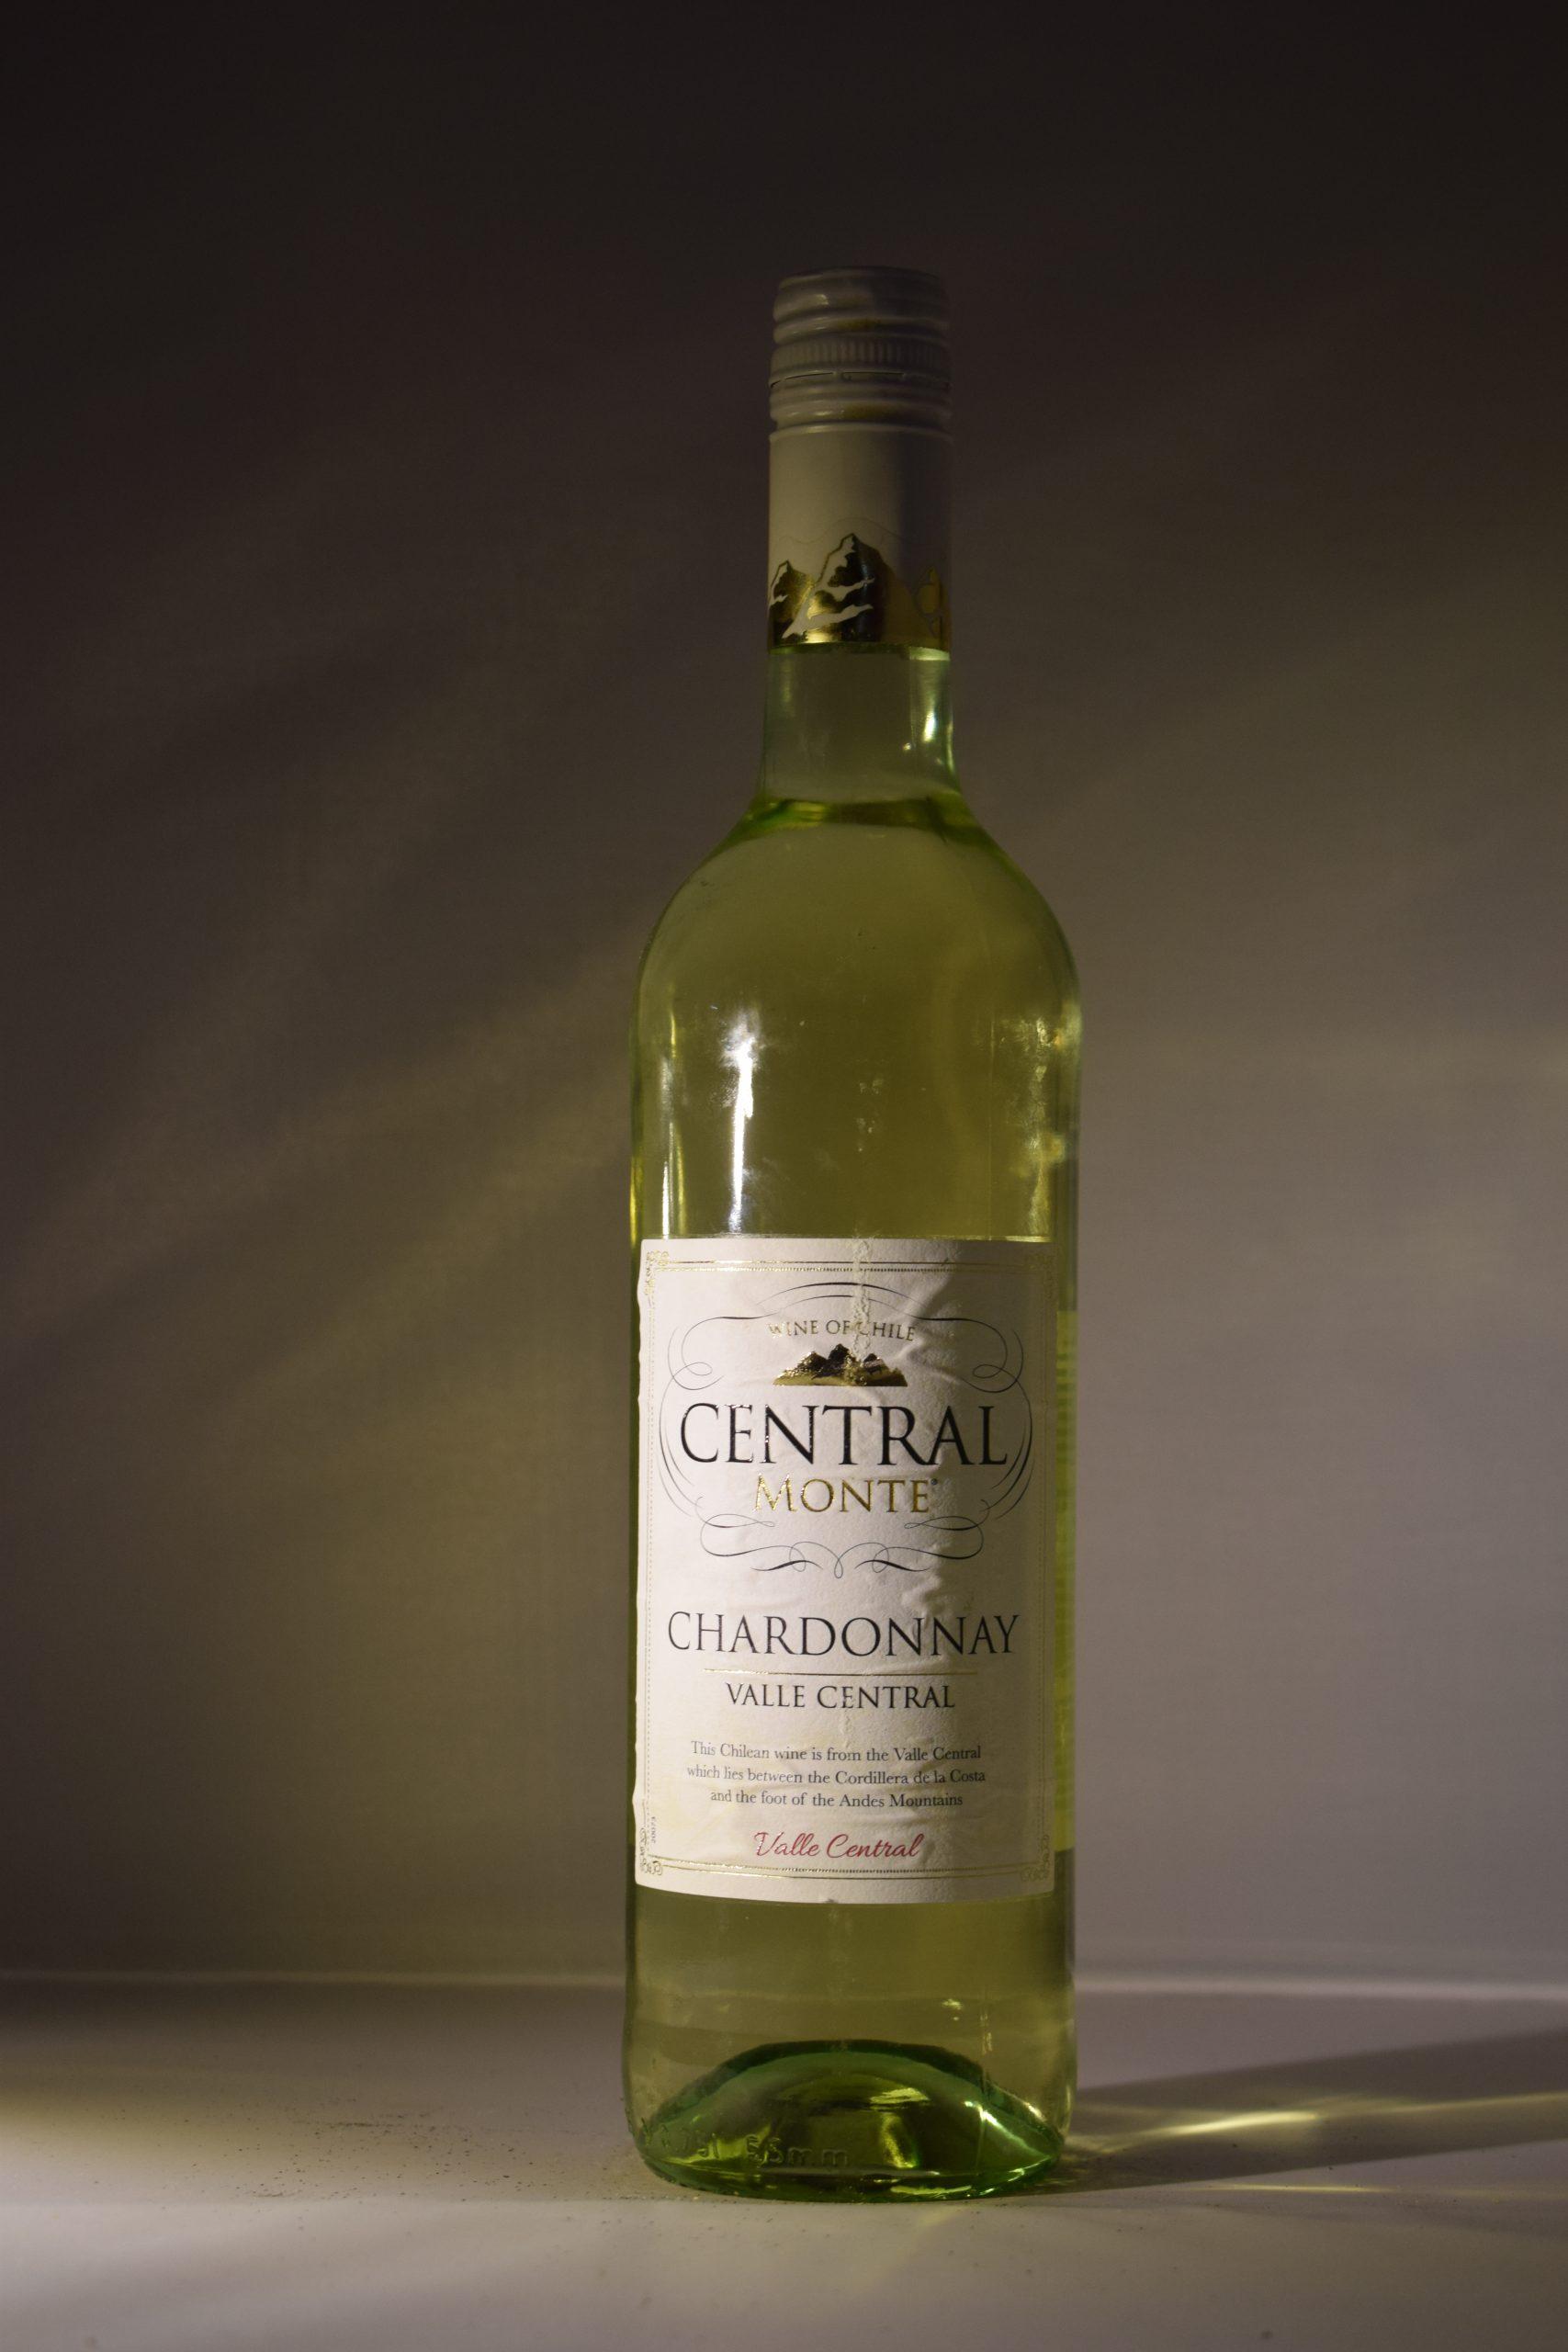 Central Monte Chardonnay